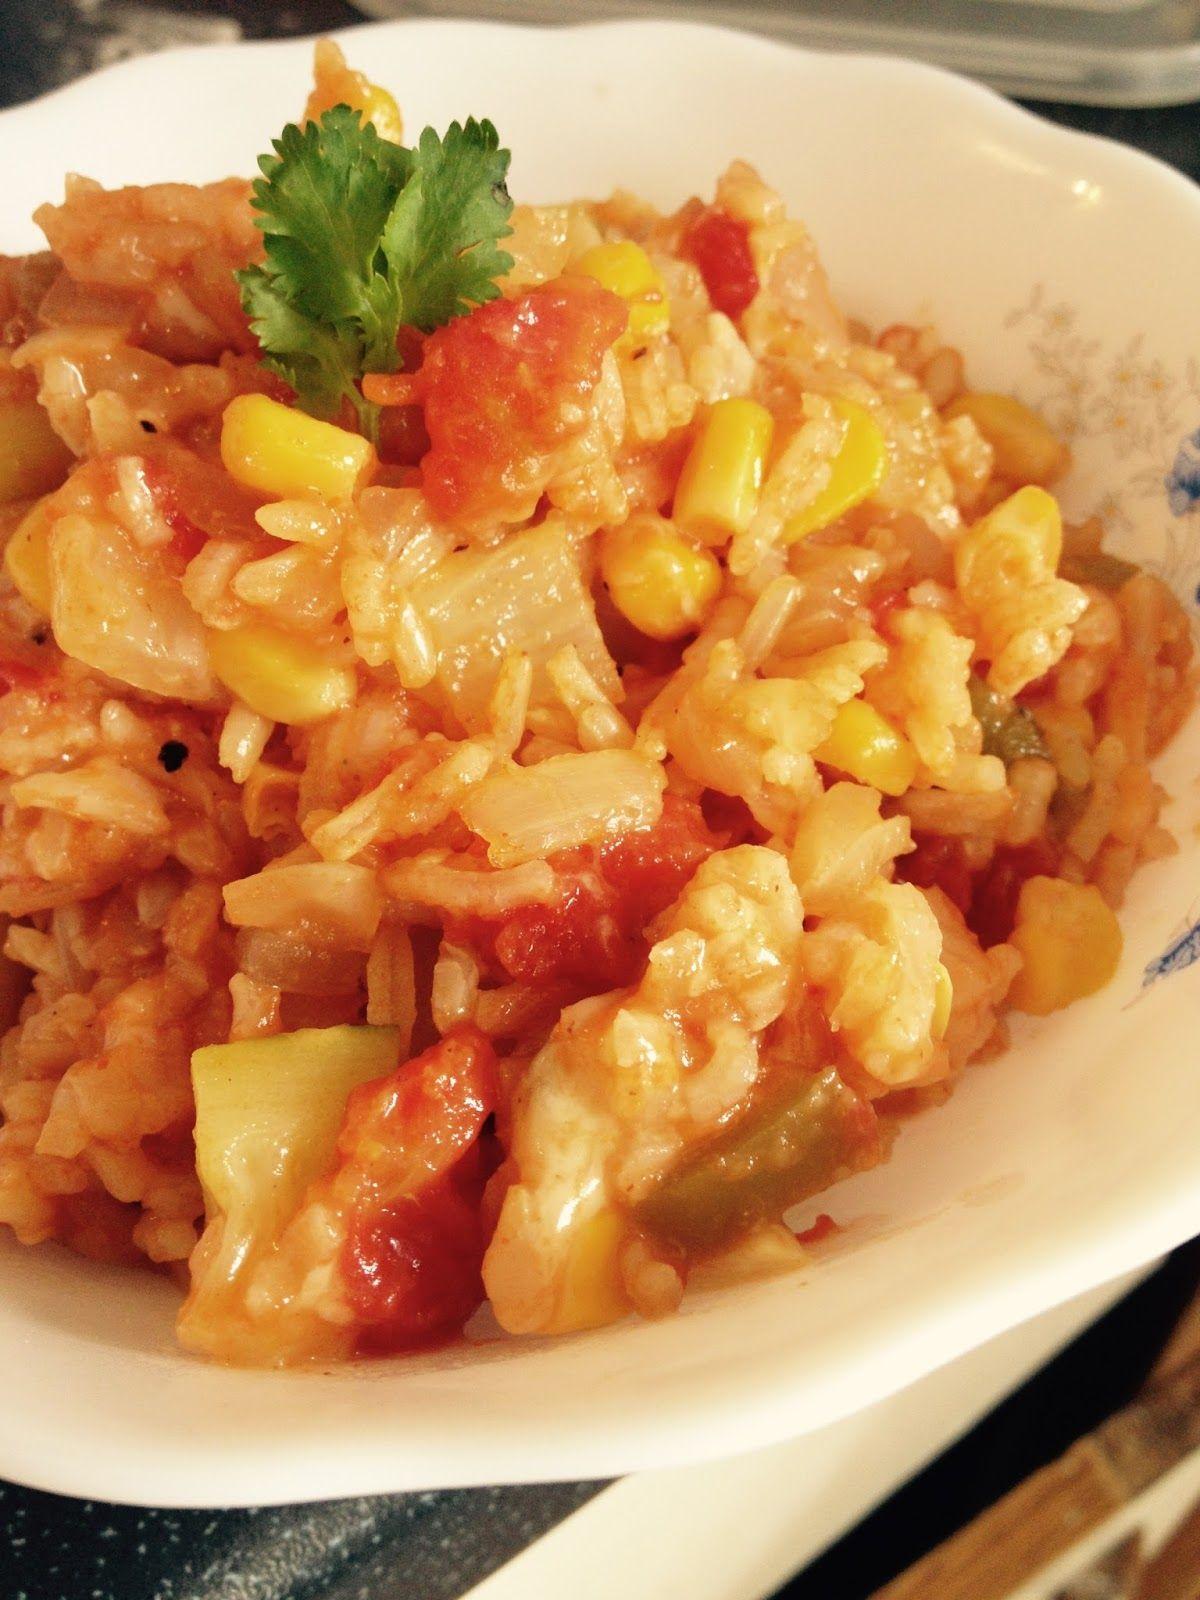 Cuisine Maligne cuisine ma-ligne!: one-pot-rice mexicain ww 7pp | riz, risottos